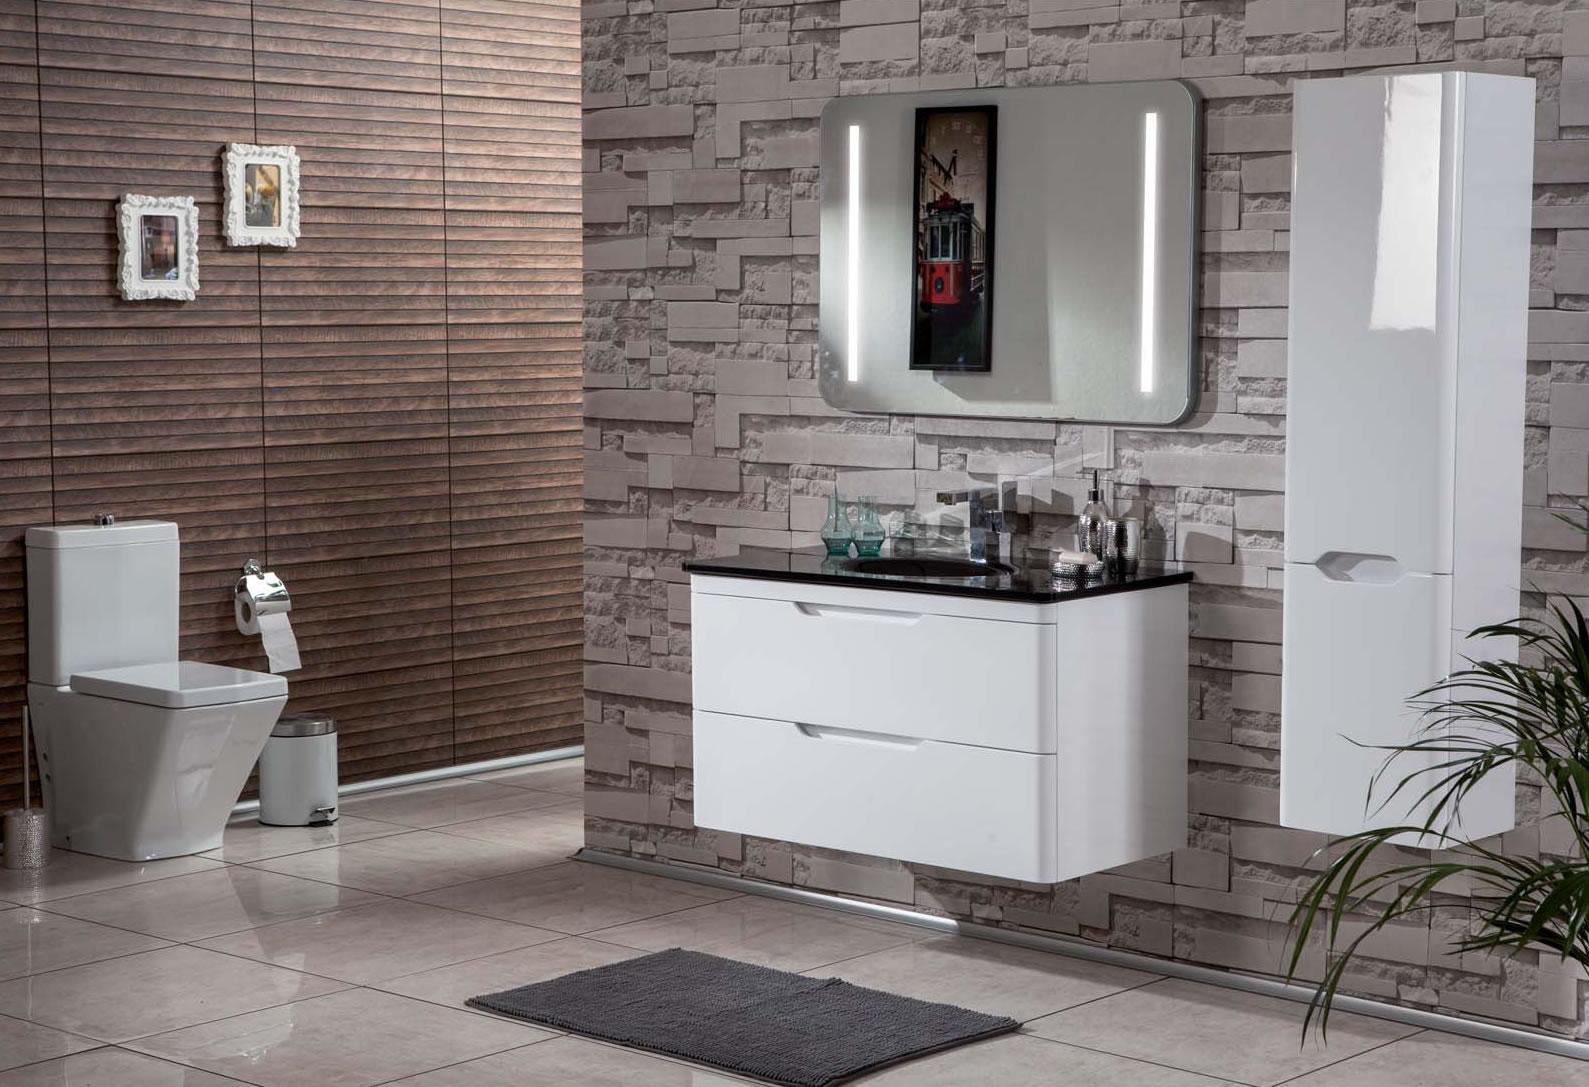 Blanco banyo dolabi dekorstyle - Banyo dekorasyon ...